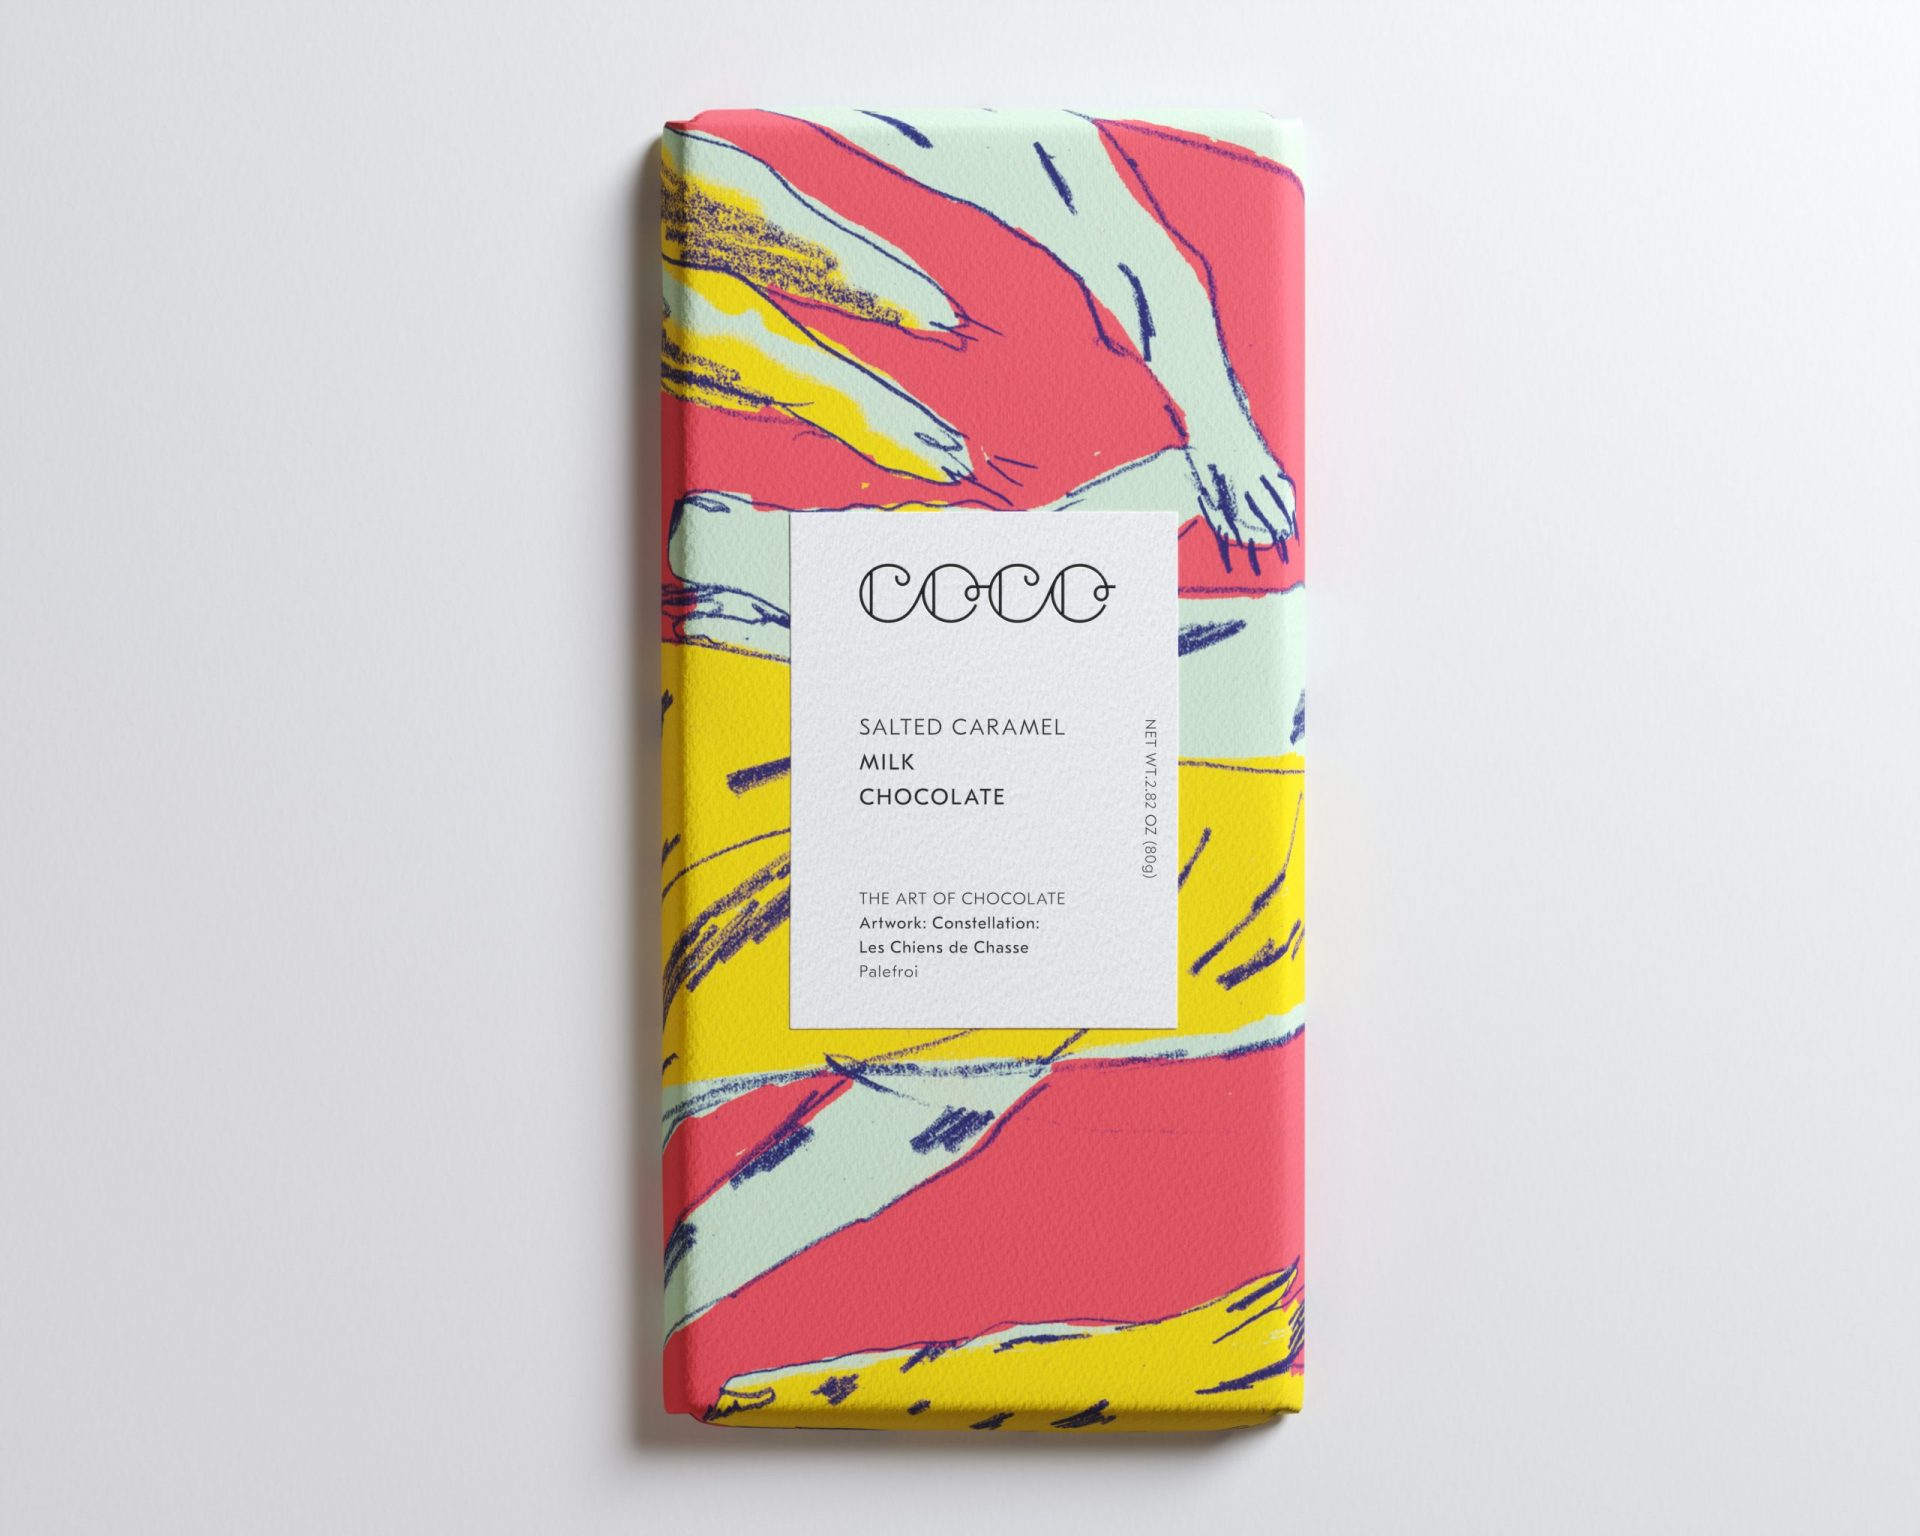 Coco Chocolatier Salted Caramel